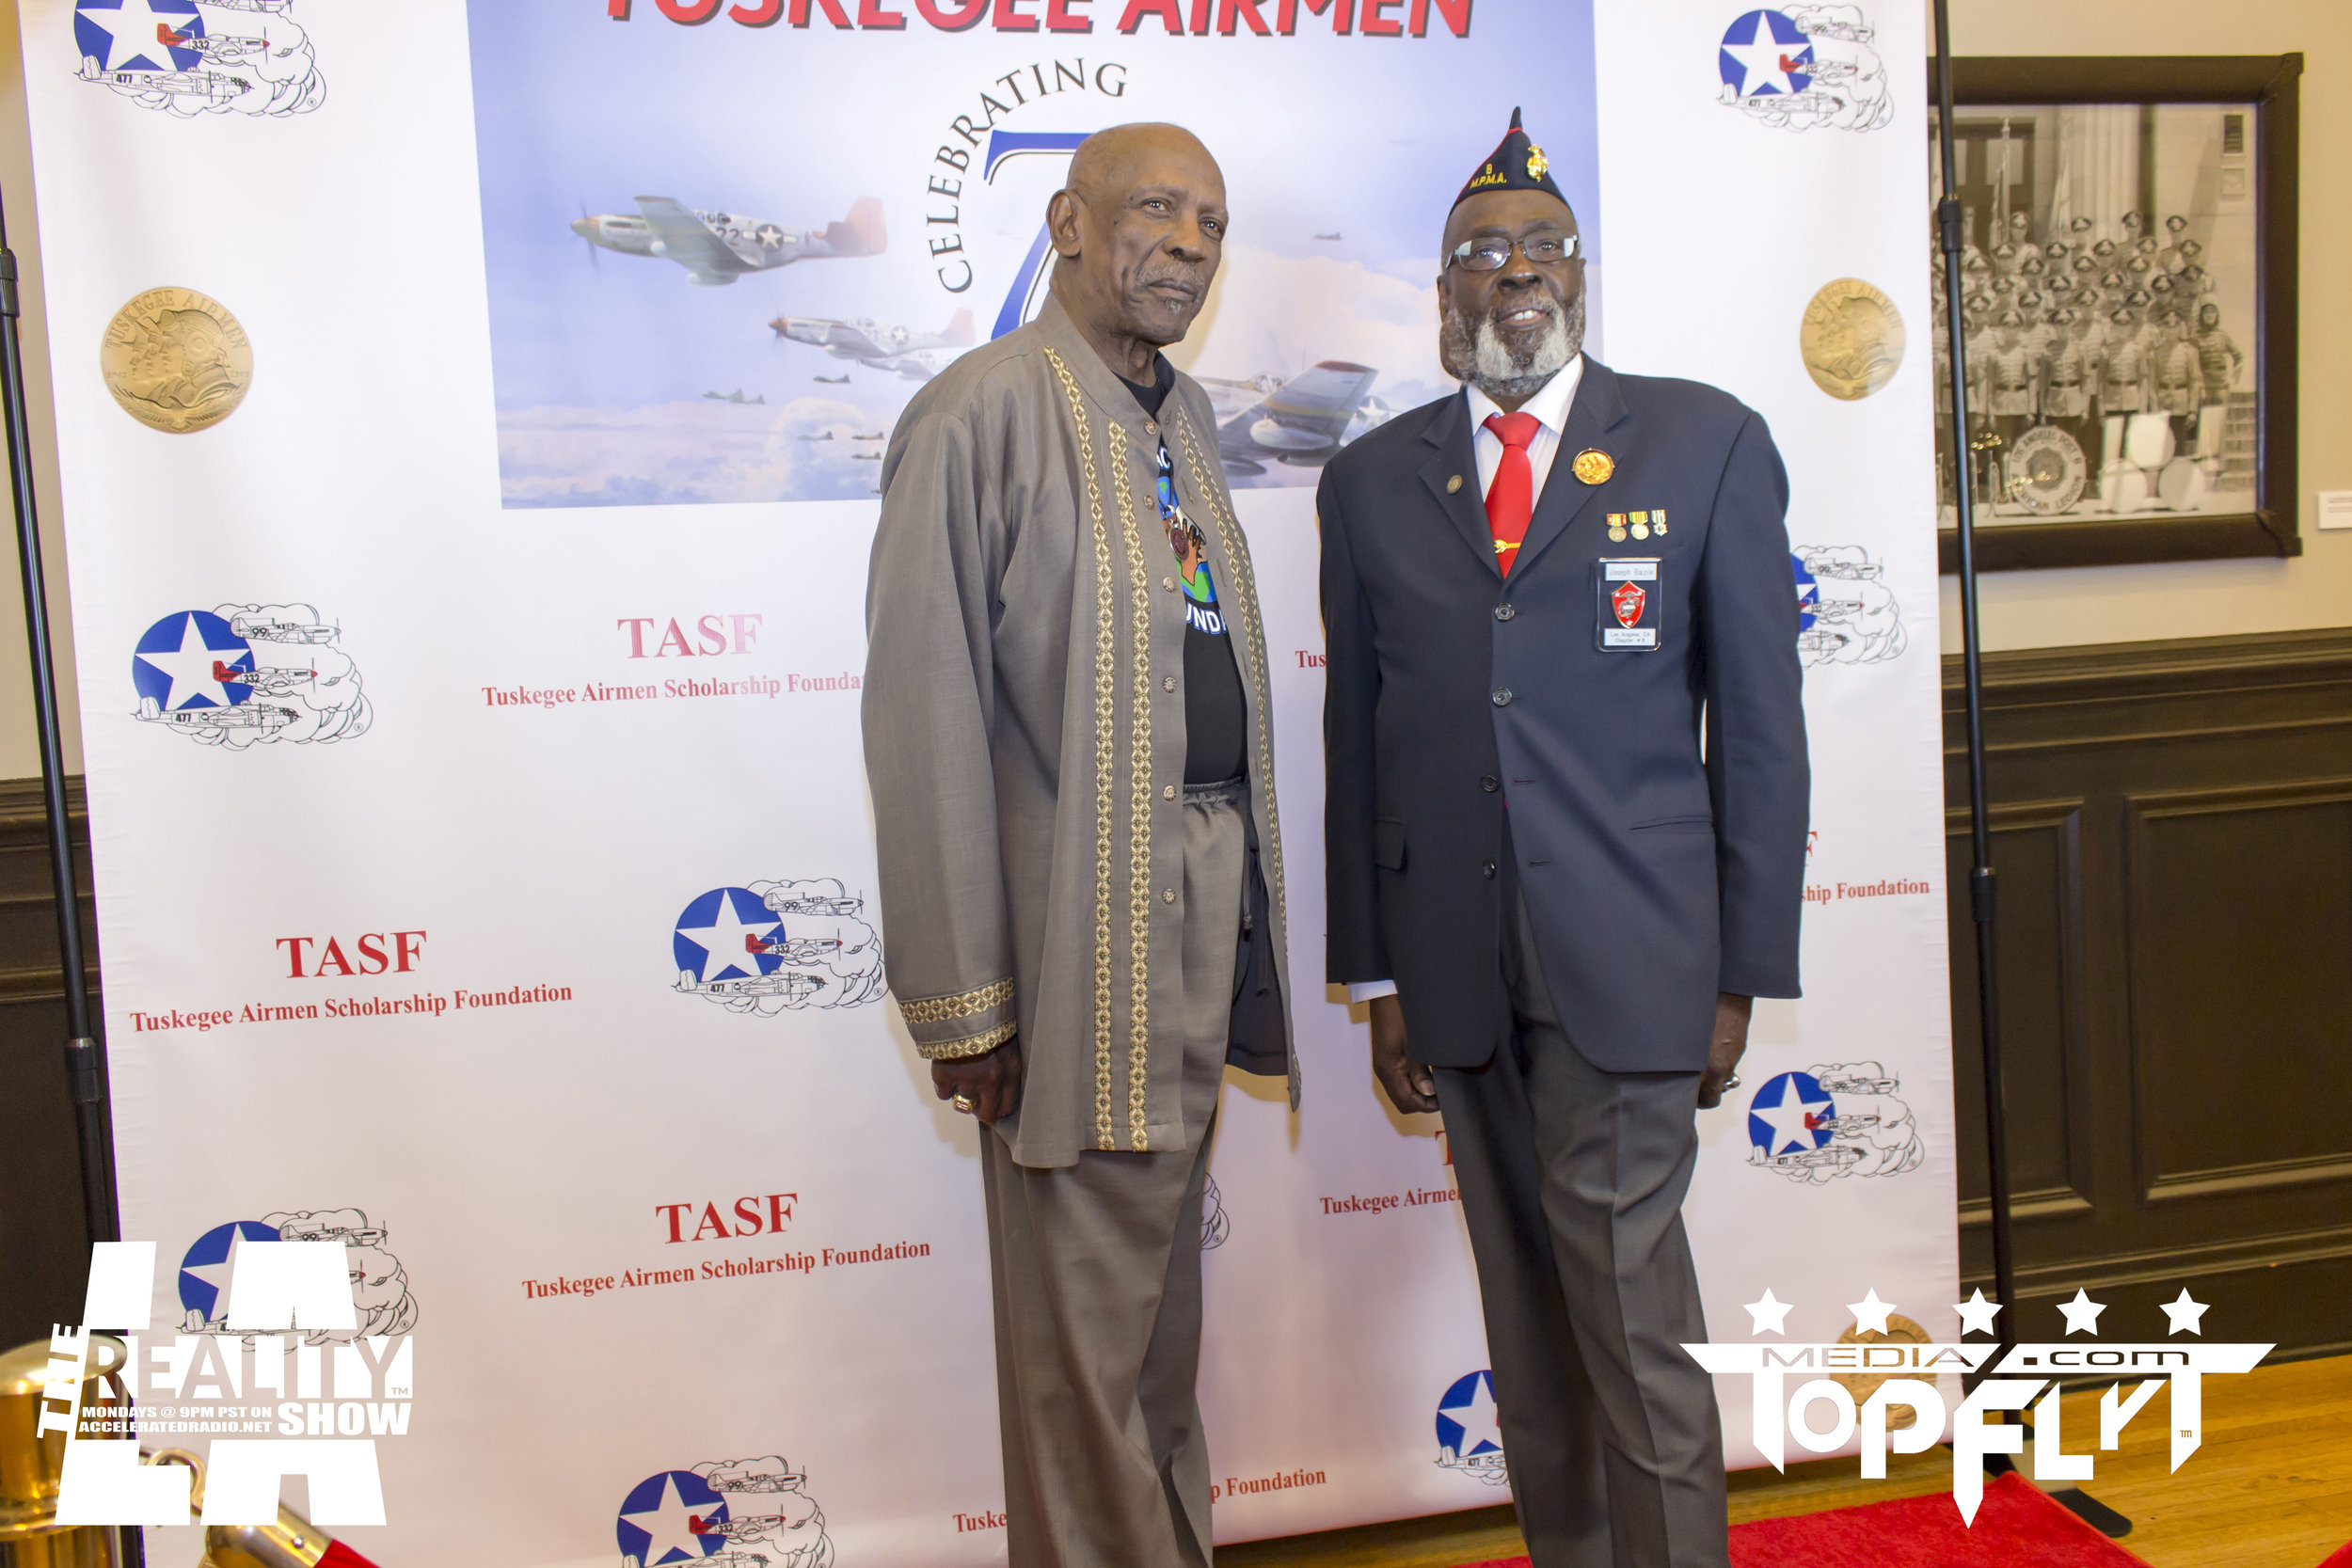 The Reality Show LA - Tuskegee Airmen 75th Anniversary VIP Reception_155.jpg